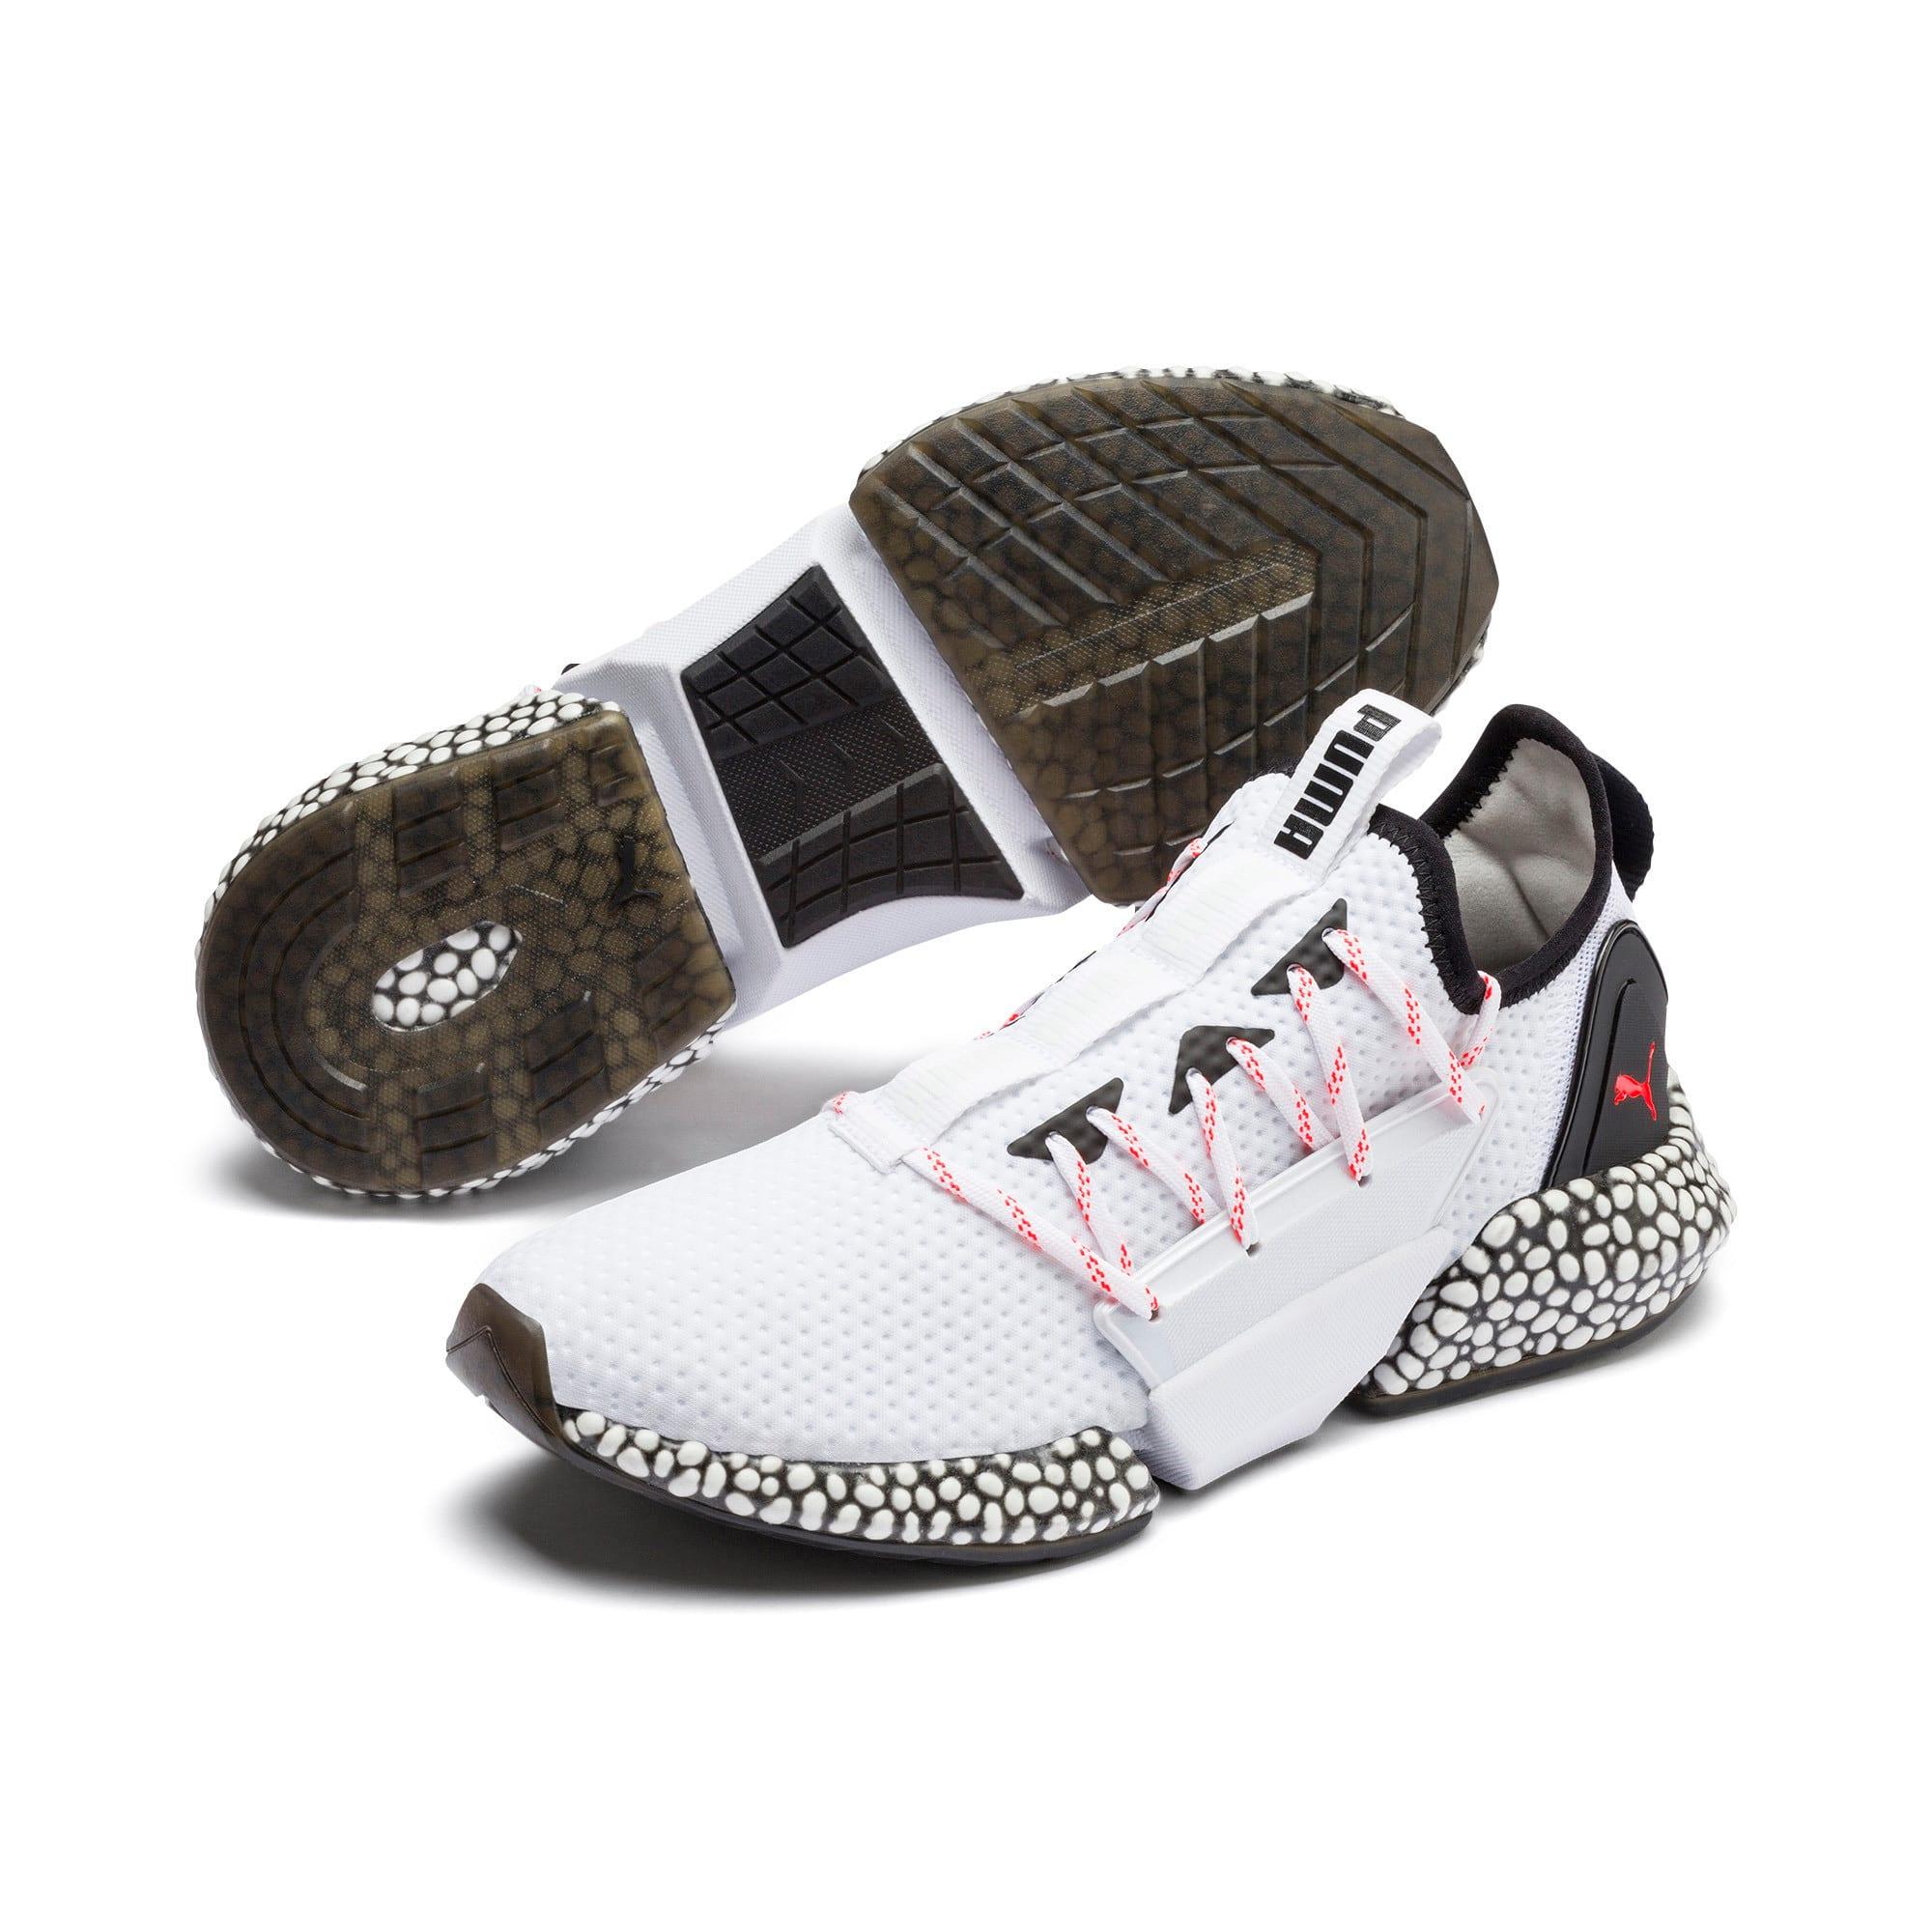 Thumbnail 3 of HYBRID Rocket Aero Men's Sneakers, Puma White-Puma Black, medium